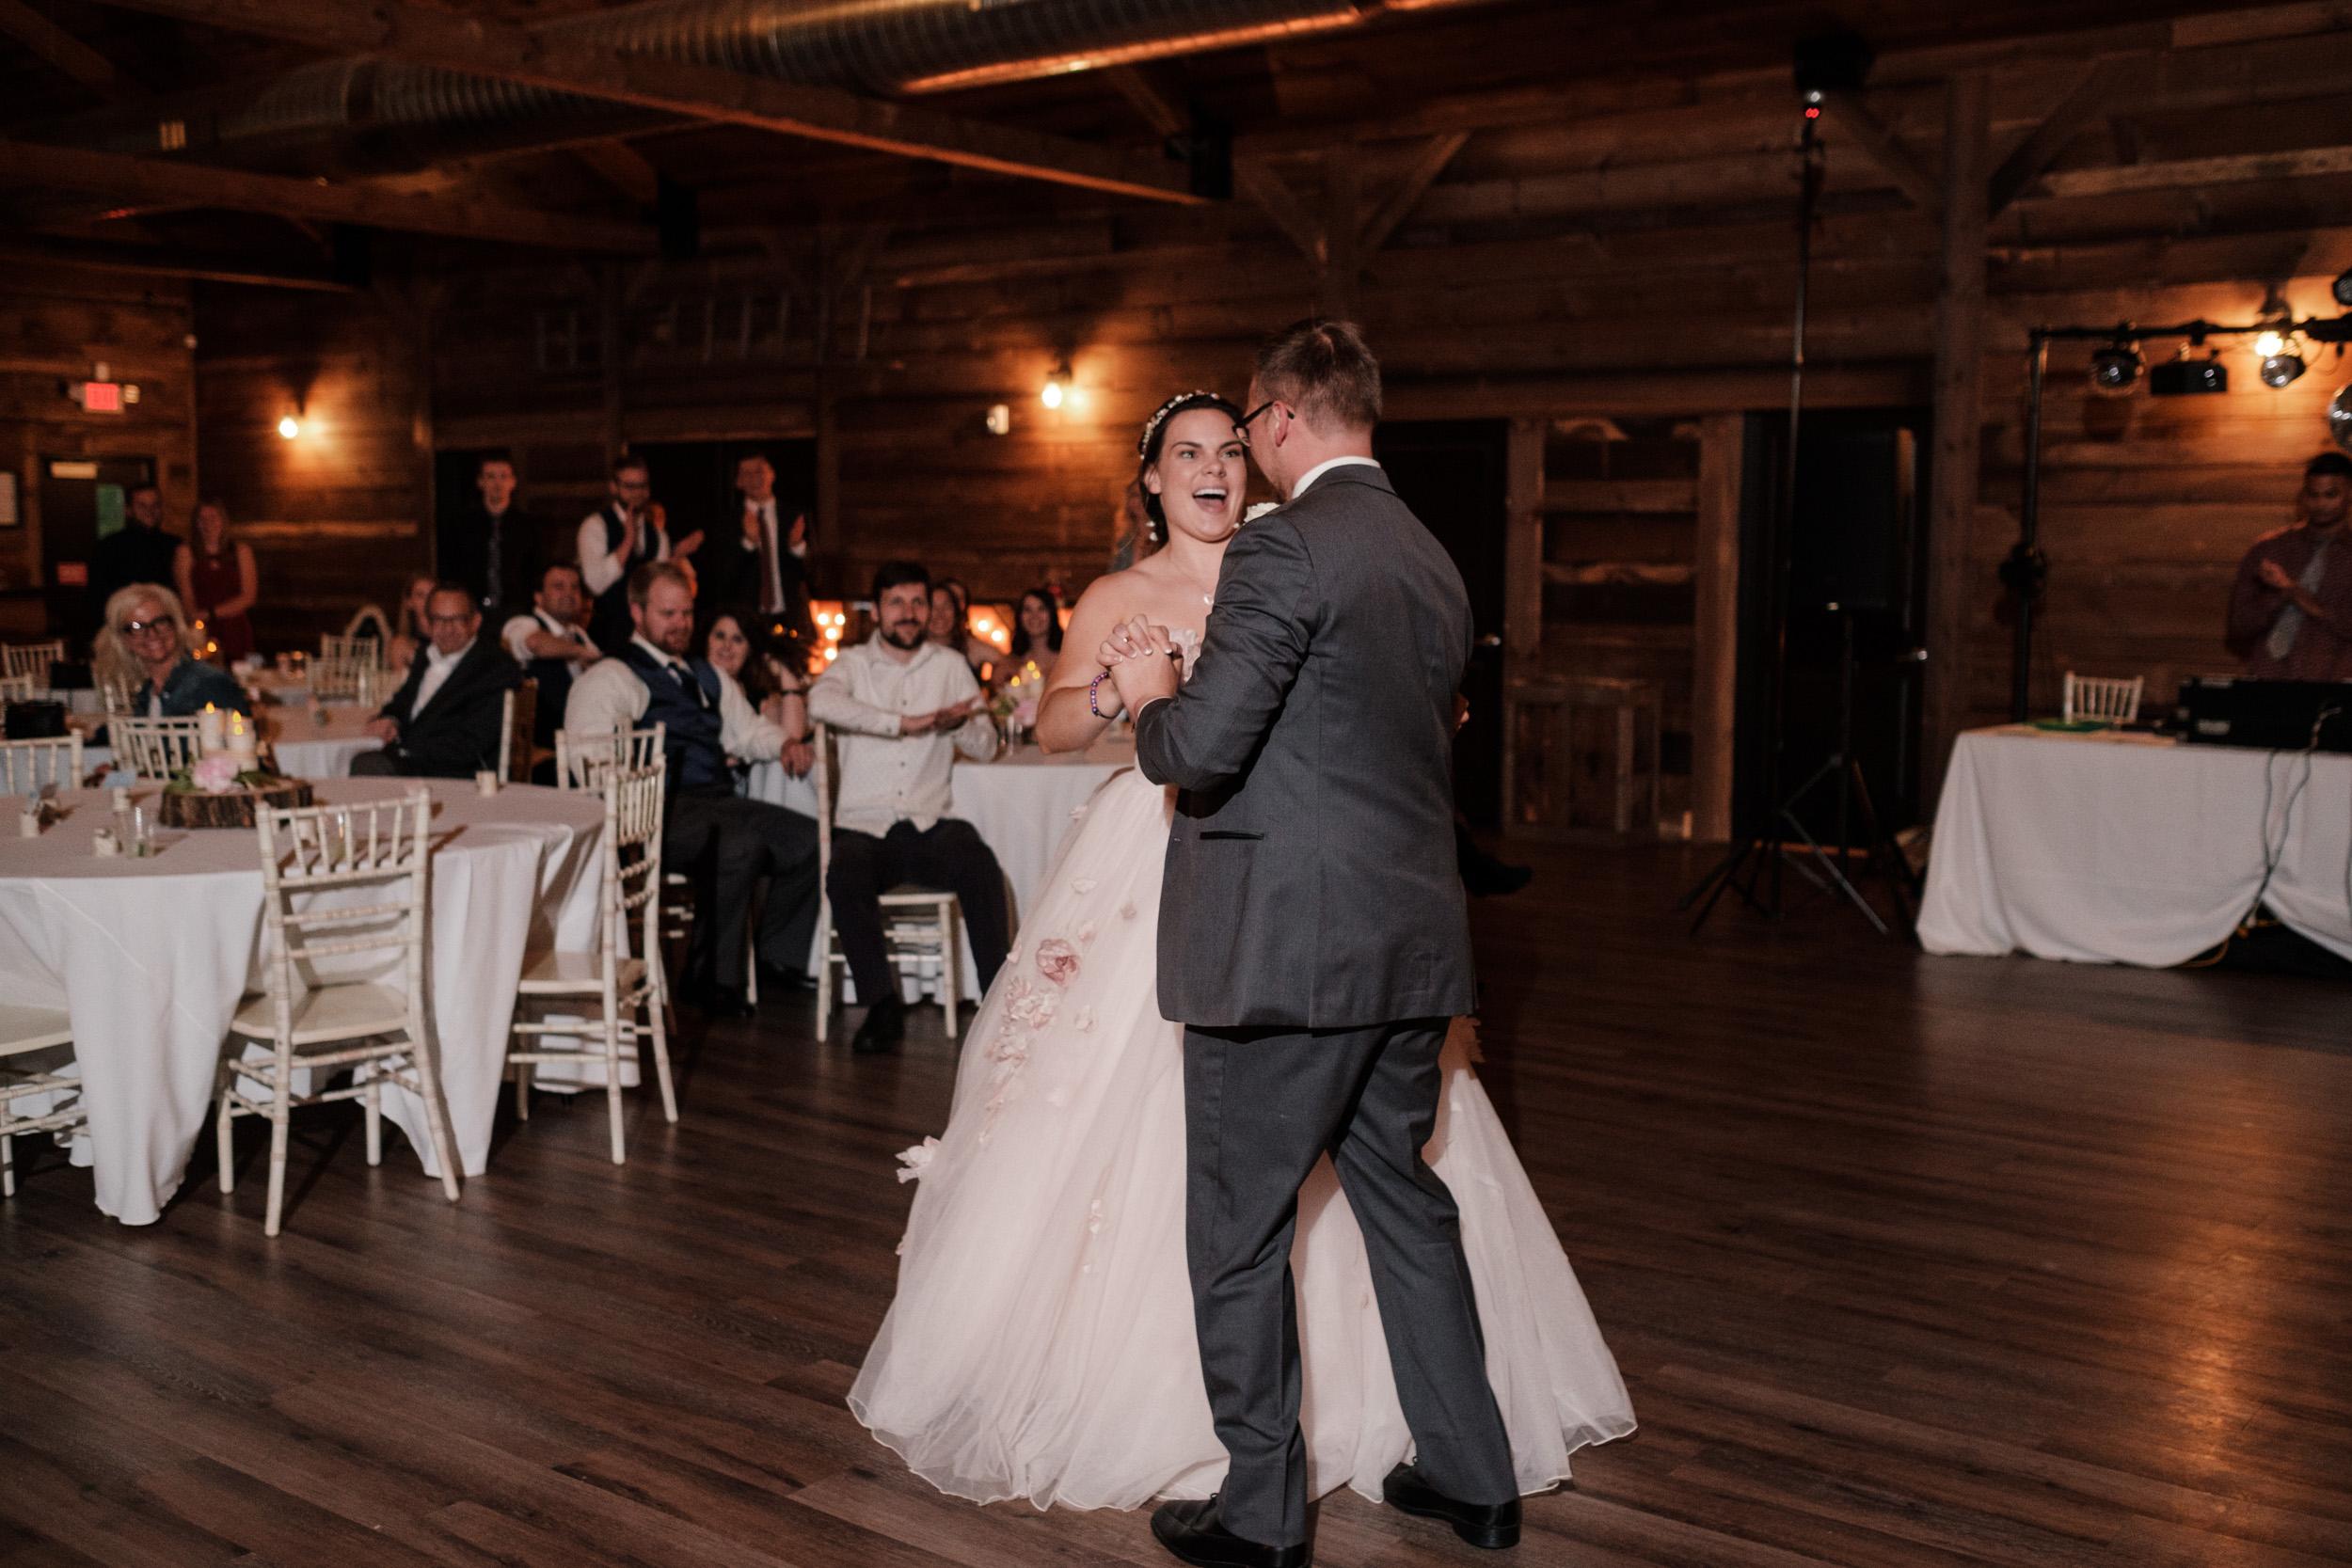 19-06-22-Ryan-Katie-The-Fields-Reserve-Wedding-74.jpg